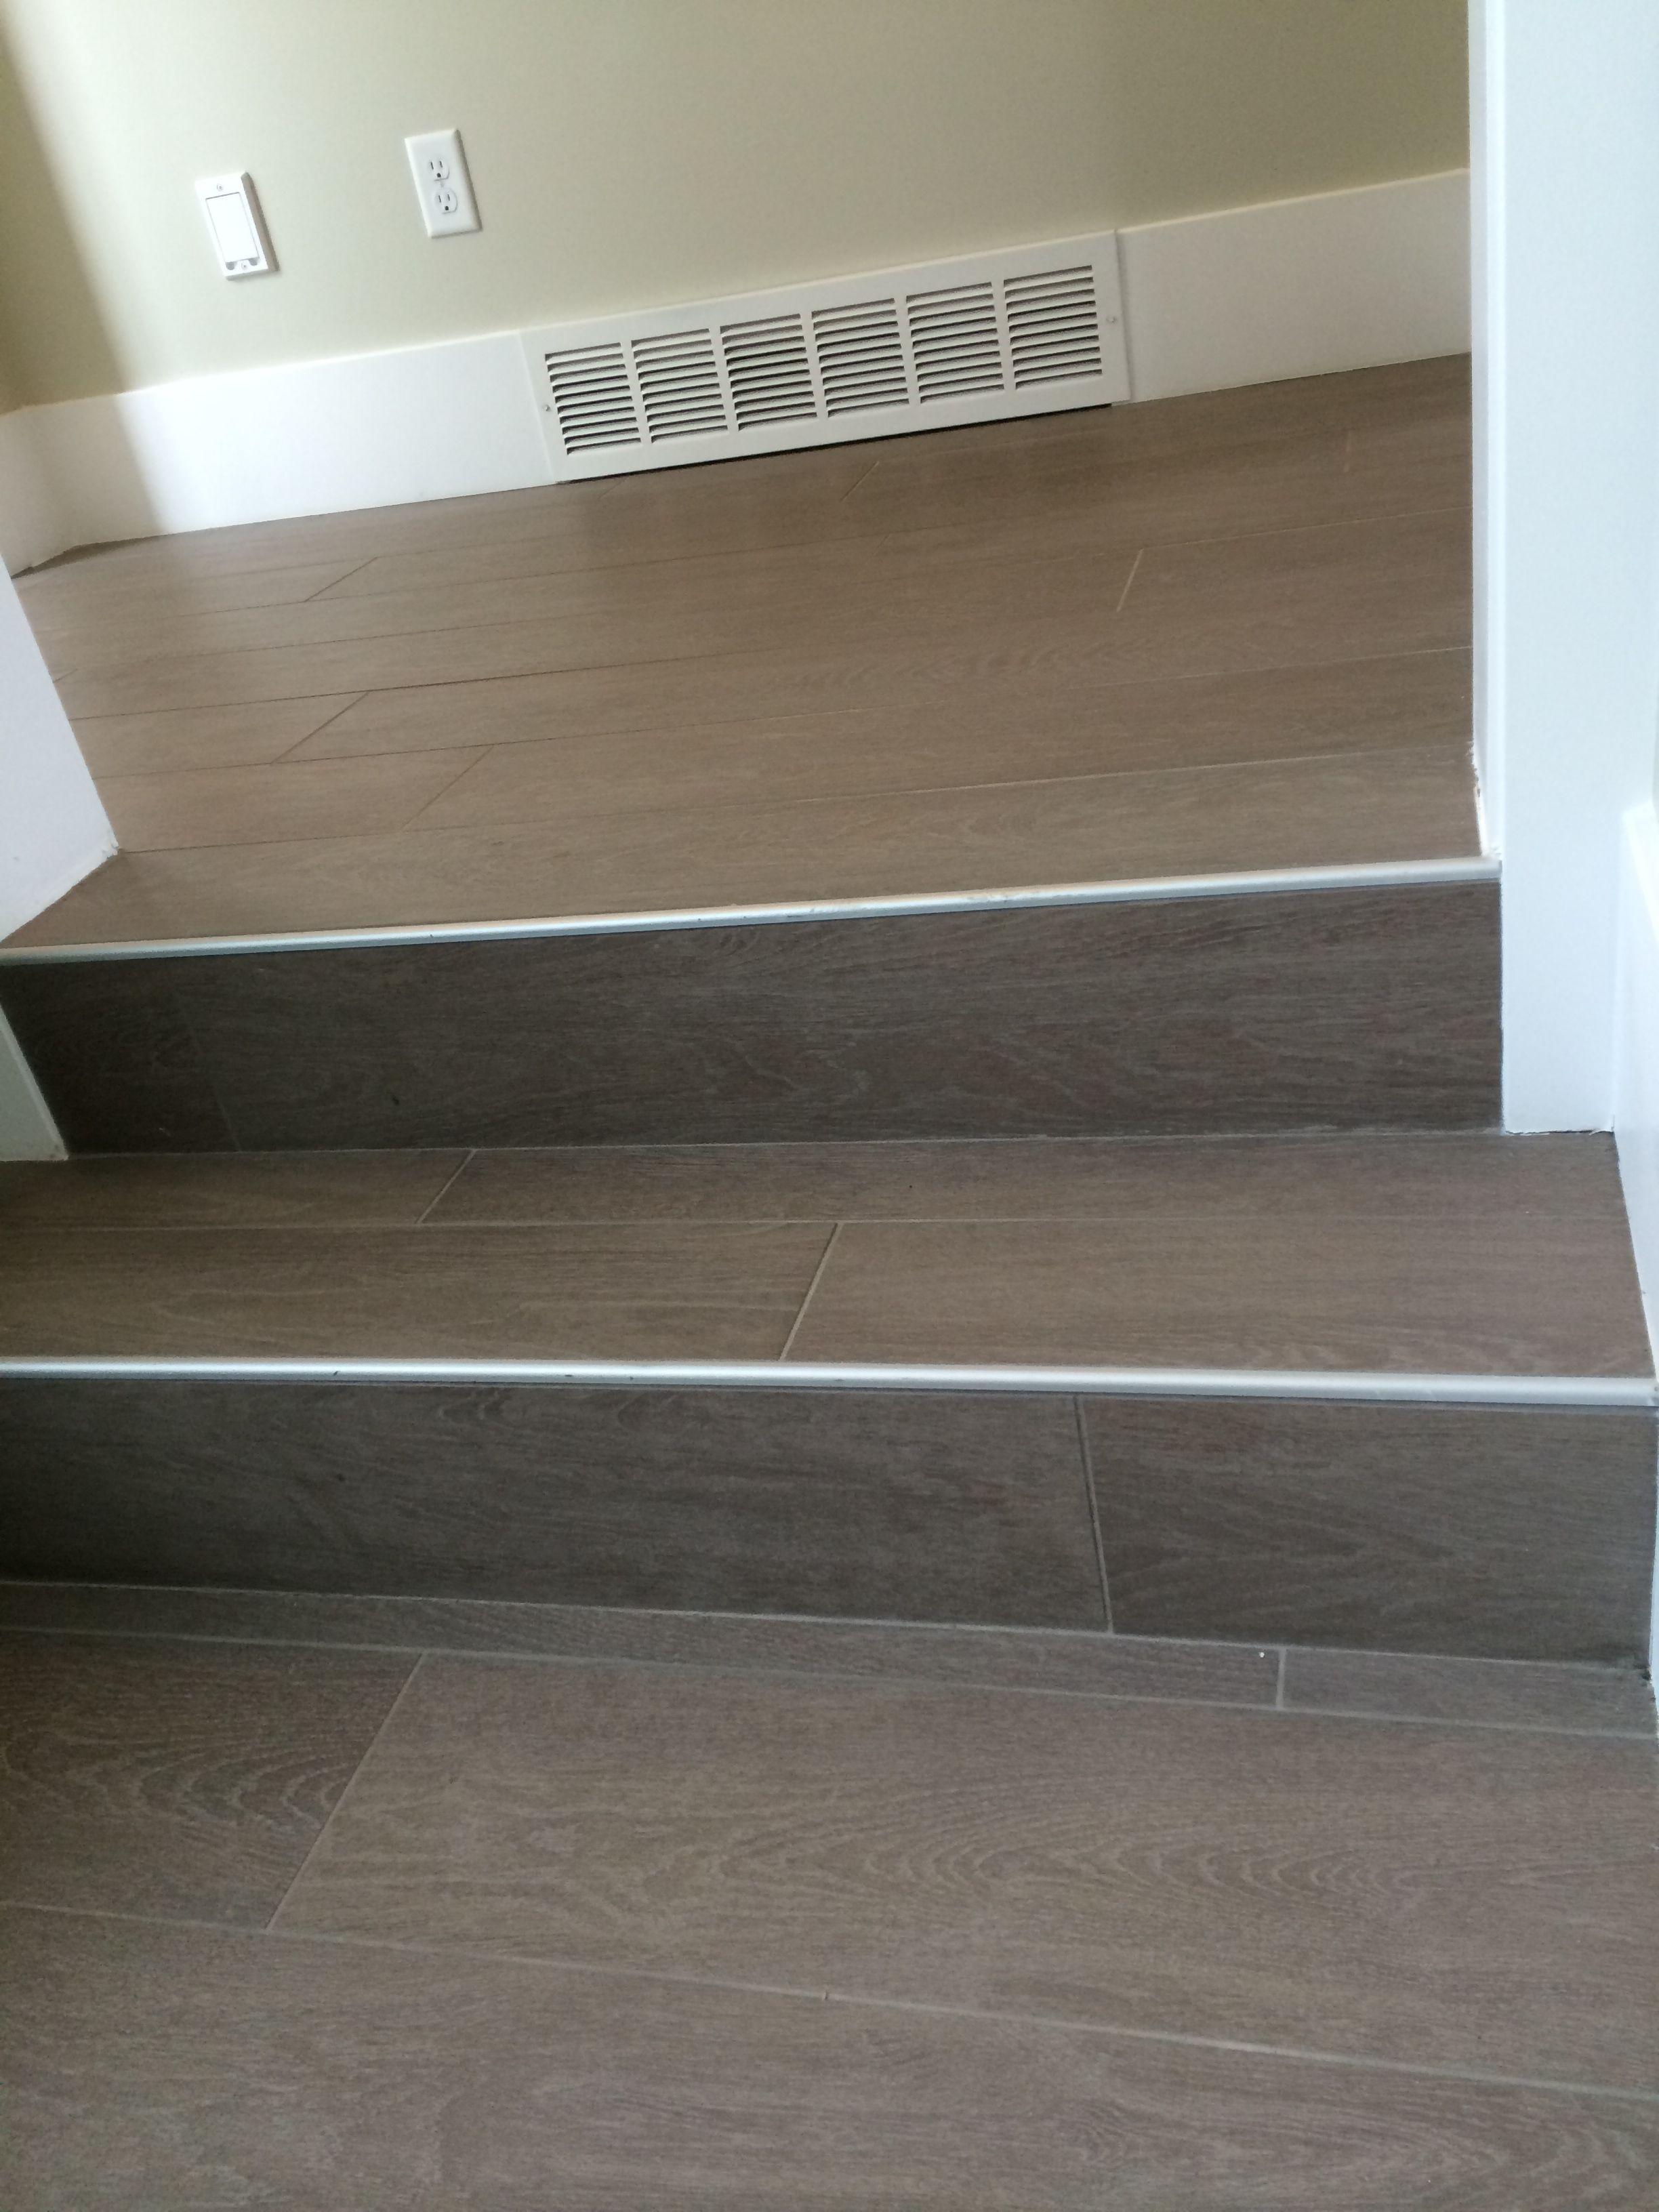 Wood Floor Tile On Stairs With Metal End Cap Laminate Stairs Tile Stairs Tiled Staircase